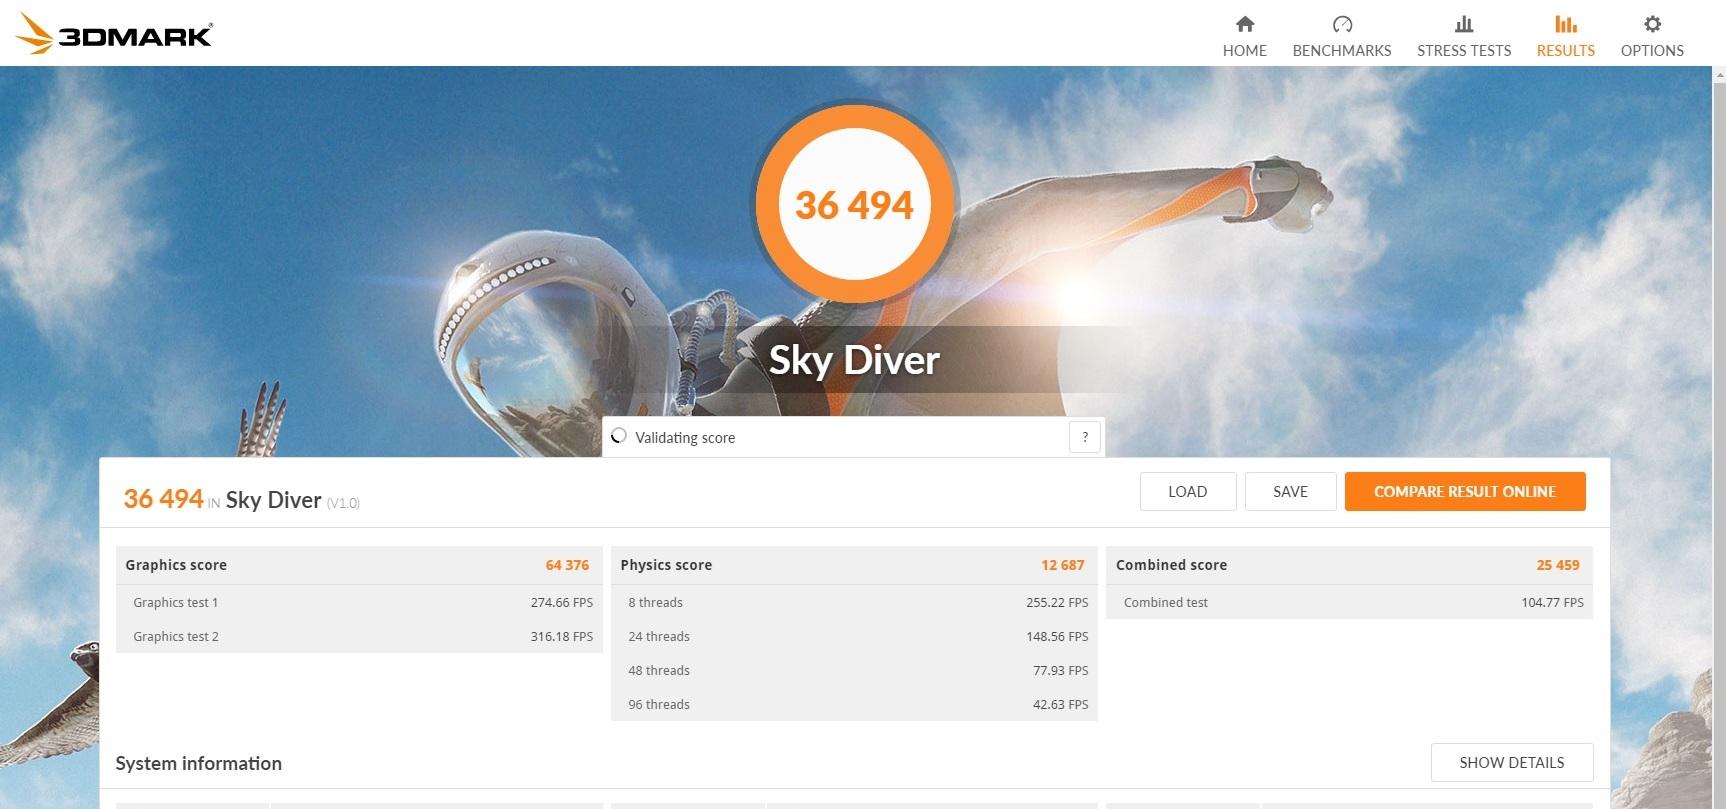 Acer Predator Triton 500-3dmark sky dive